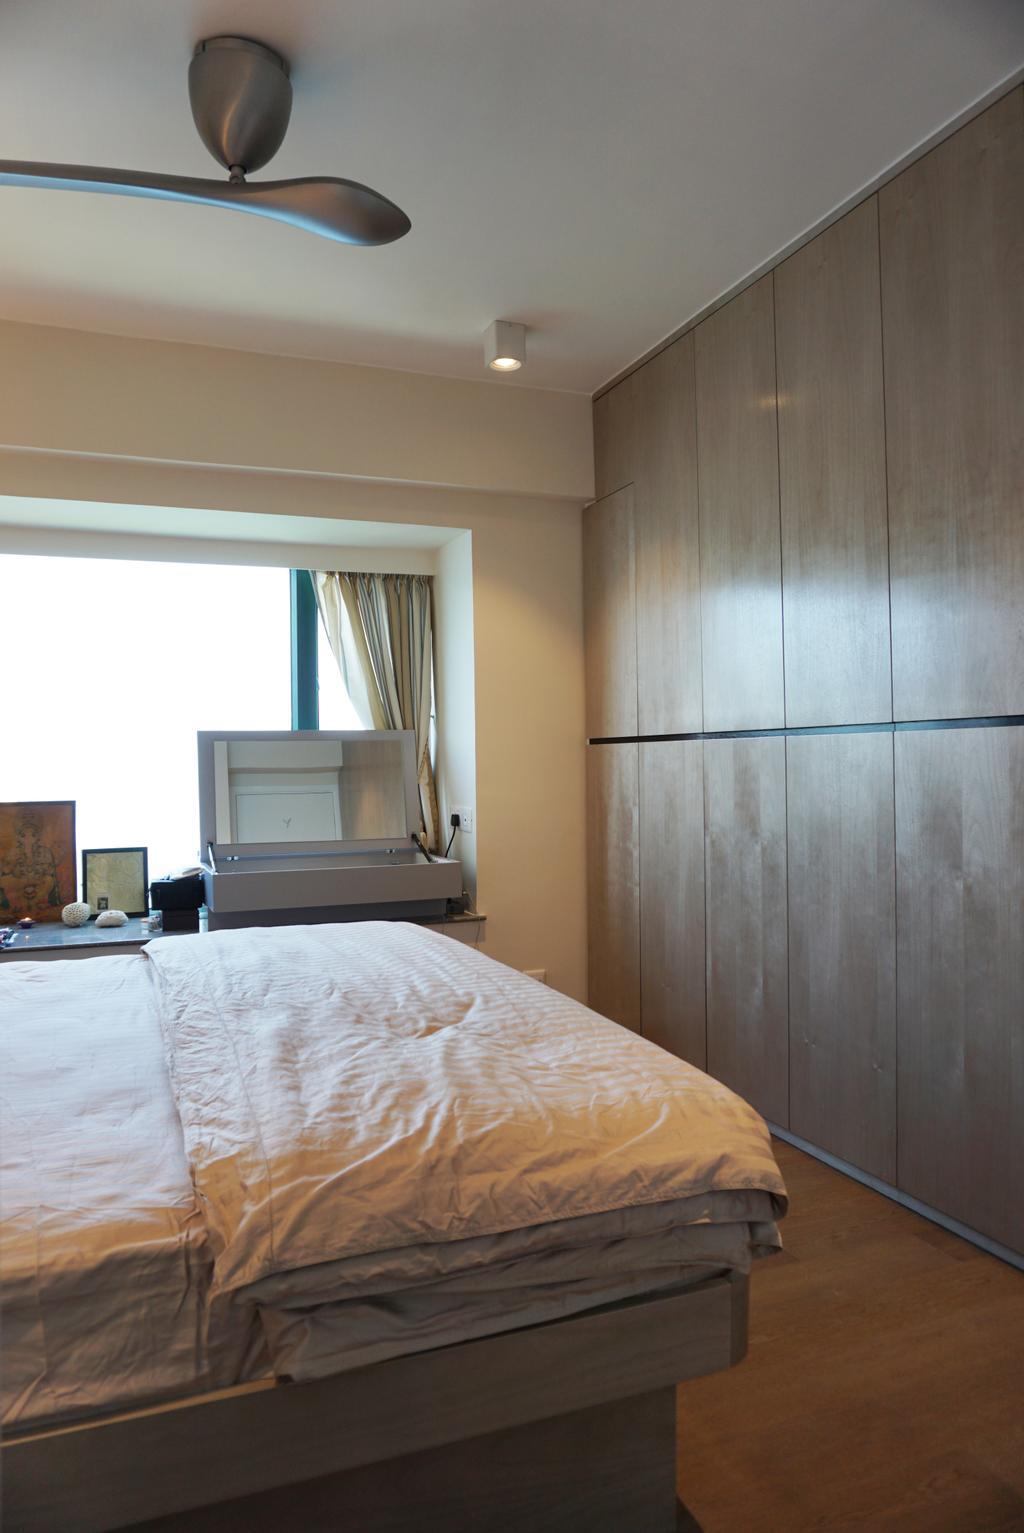 私家樓, 睡房, 觀瀾雅軒, 室內設計師, AQUA Projects